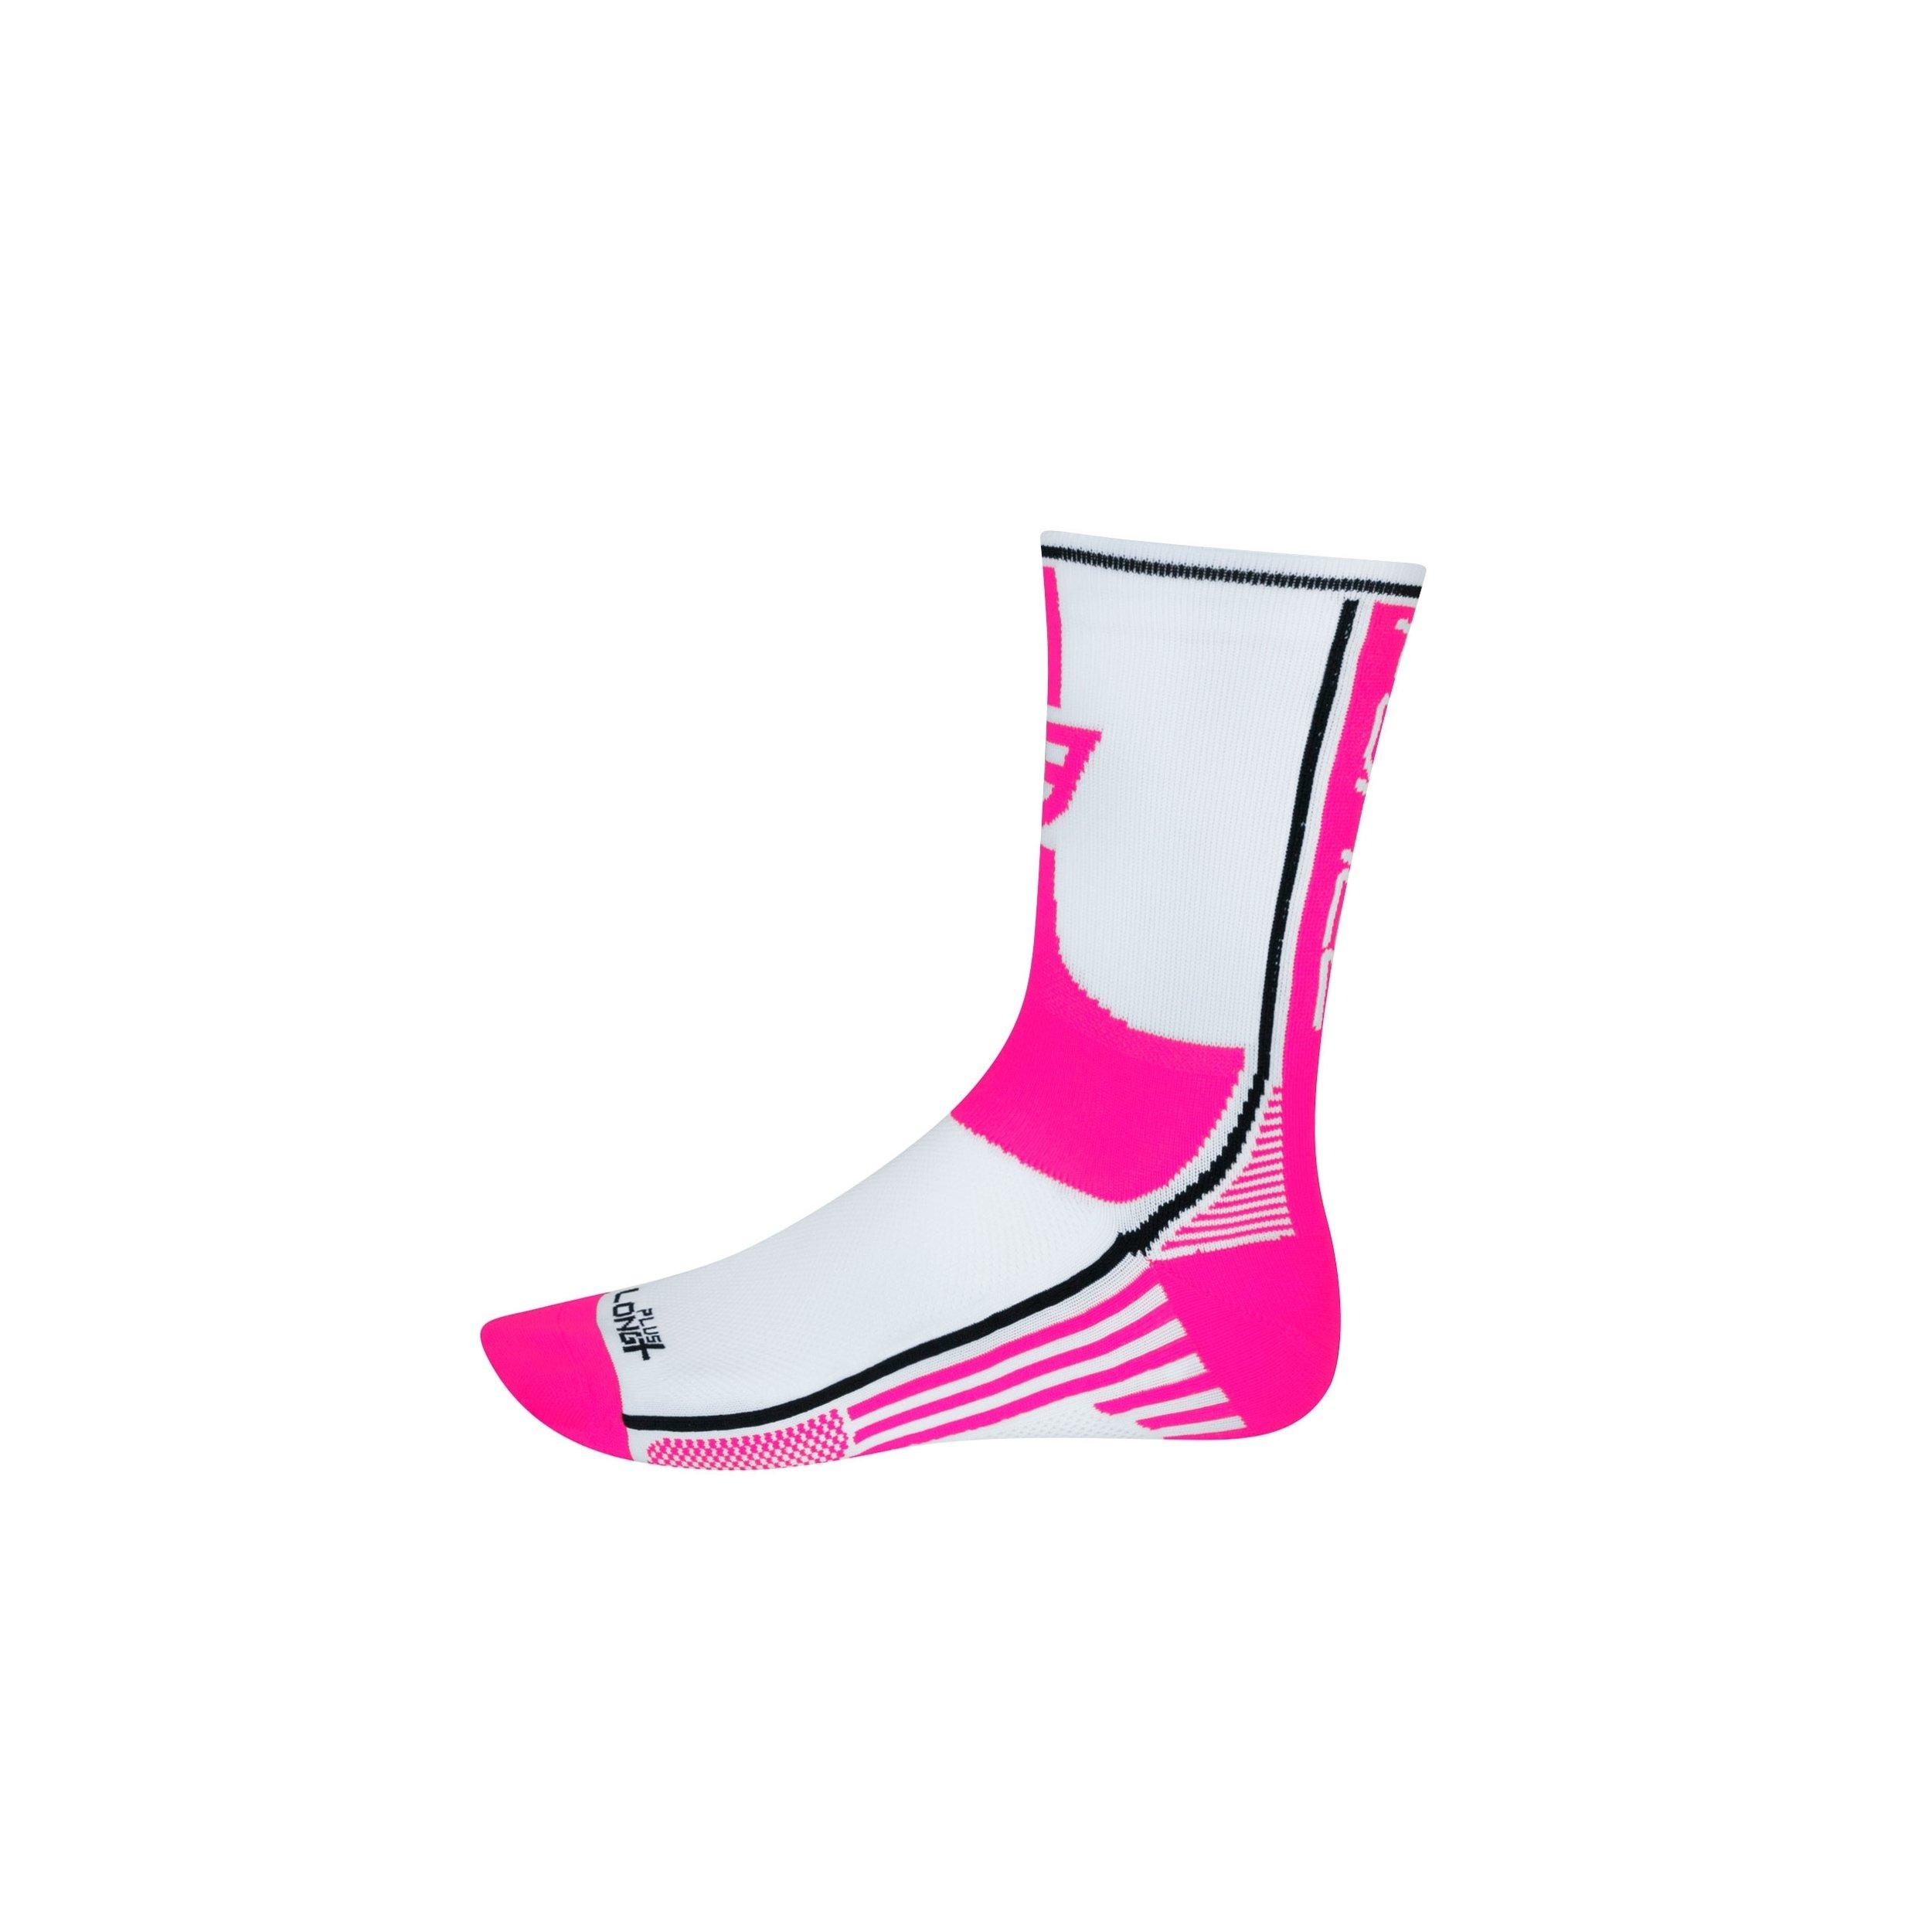 Force Long cykelsokker hvid/pink | Socks